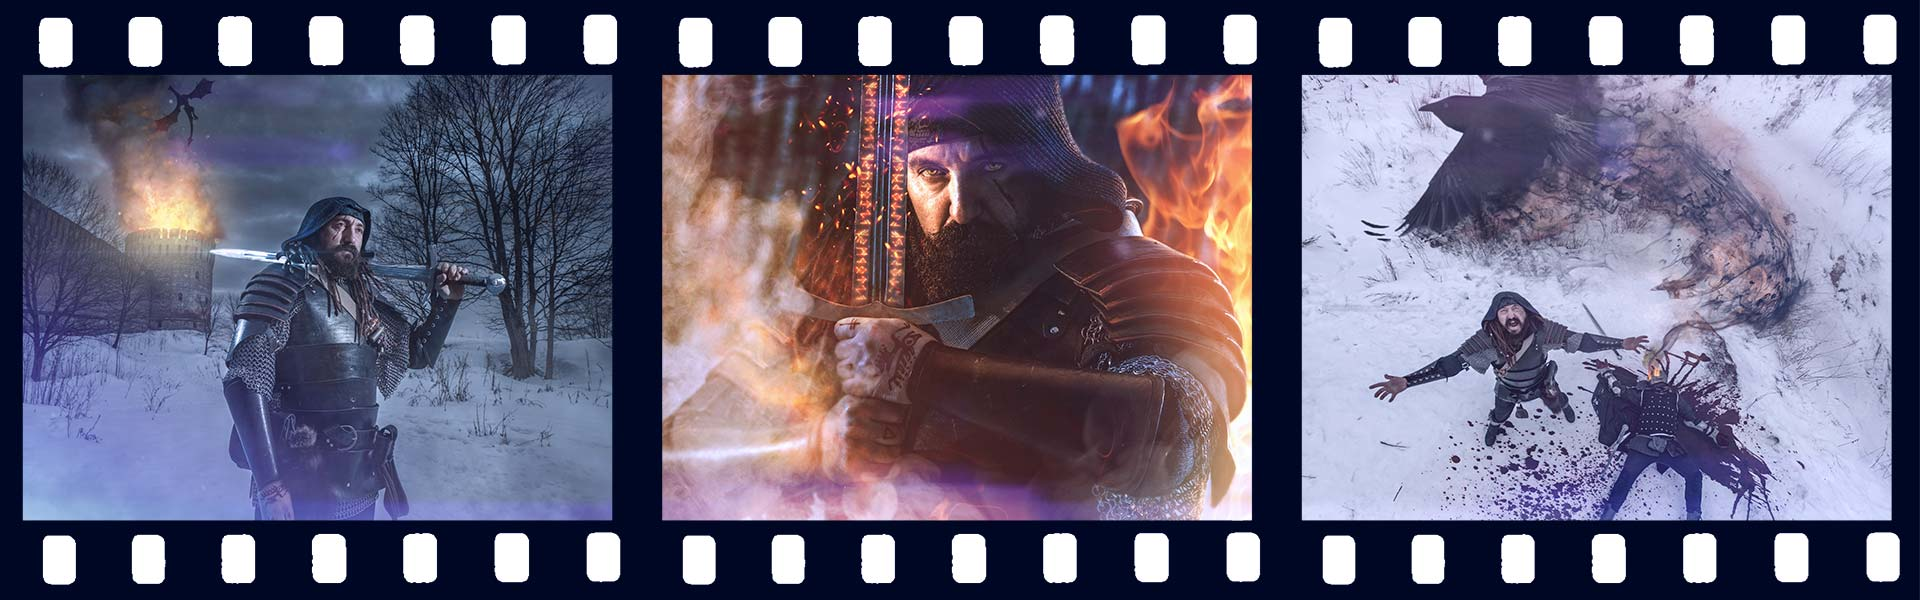 фотосессия Ведьмак The Witcher